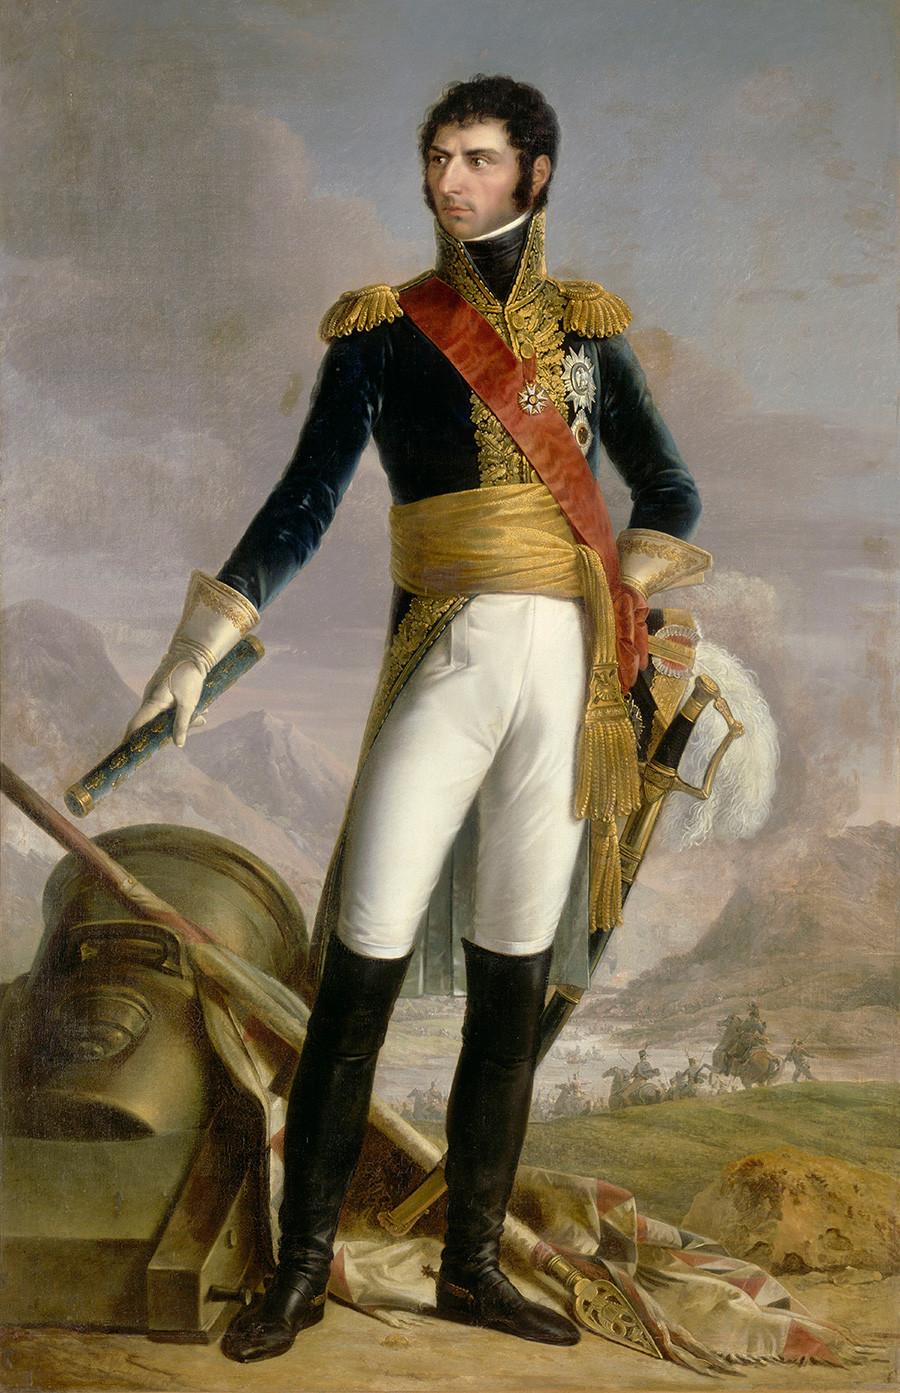 Jean Baptiste Bernadotte, seorang marsekal Prancis, raja Swedia dan Norwegia, 1818, dalam lukisan karya Francois Joseph Kinson.